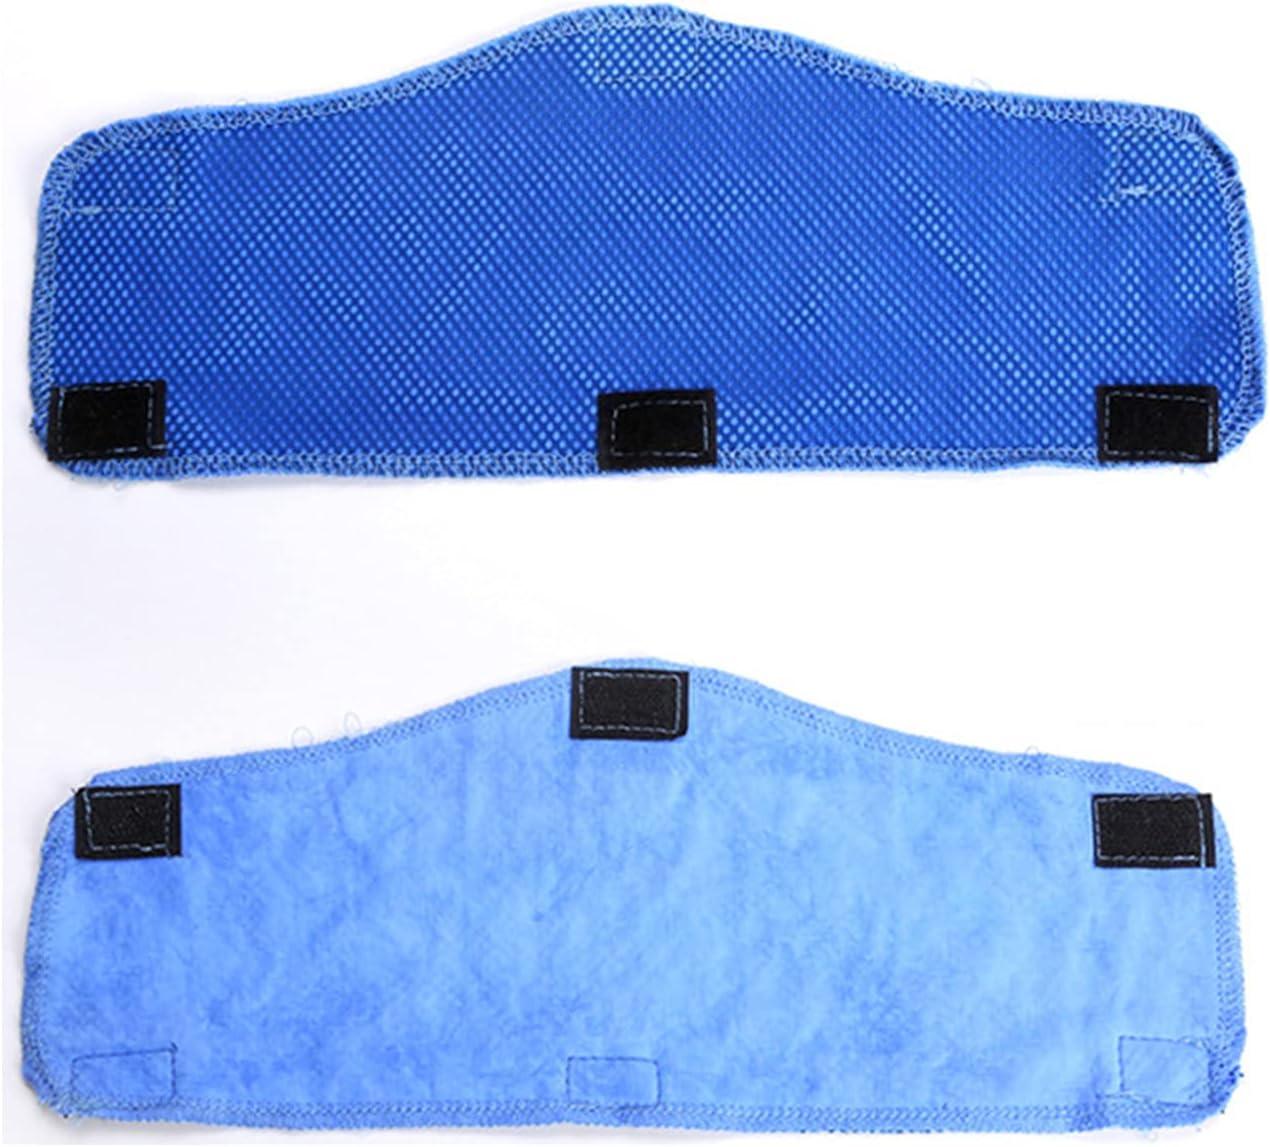 VELIHOME Cooling Super-cheap Hard Jacksonville Mall Sweatband-Reusable Hat Sweatband